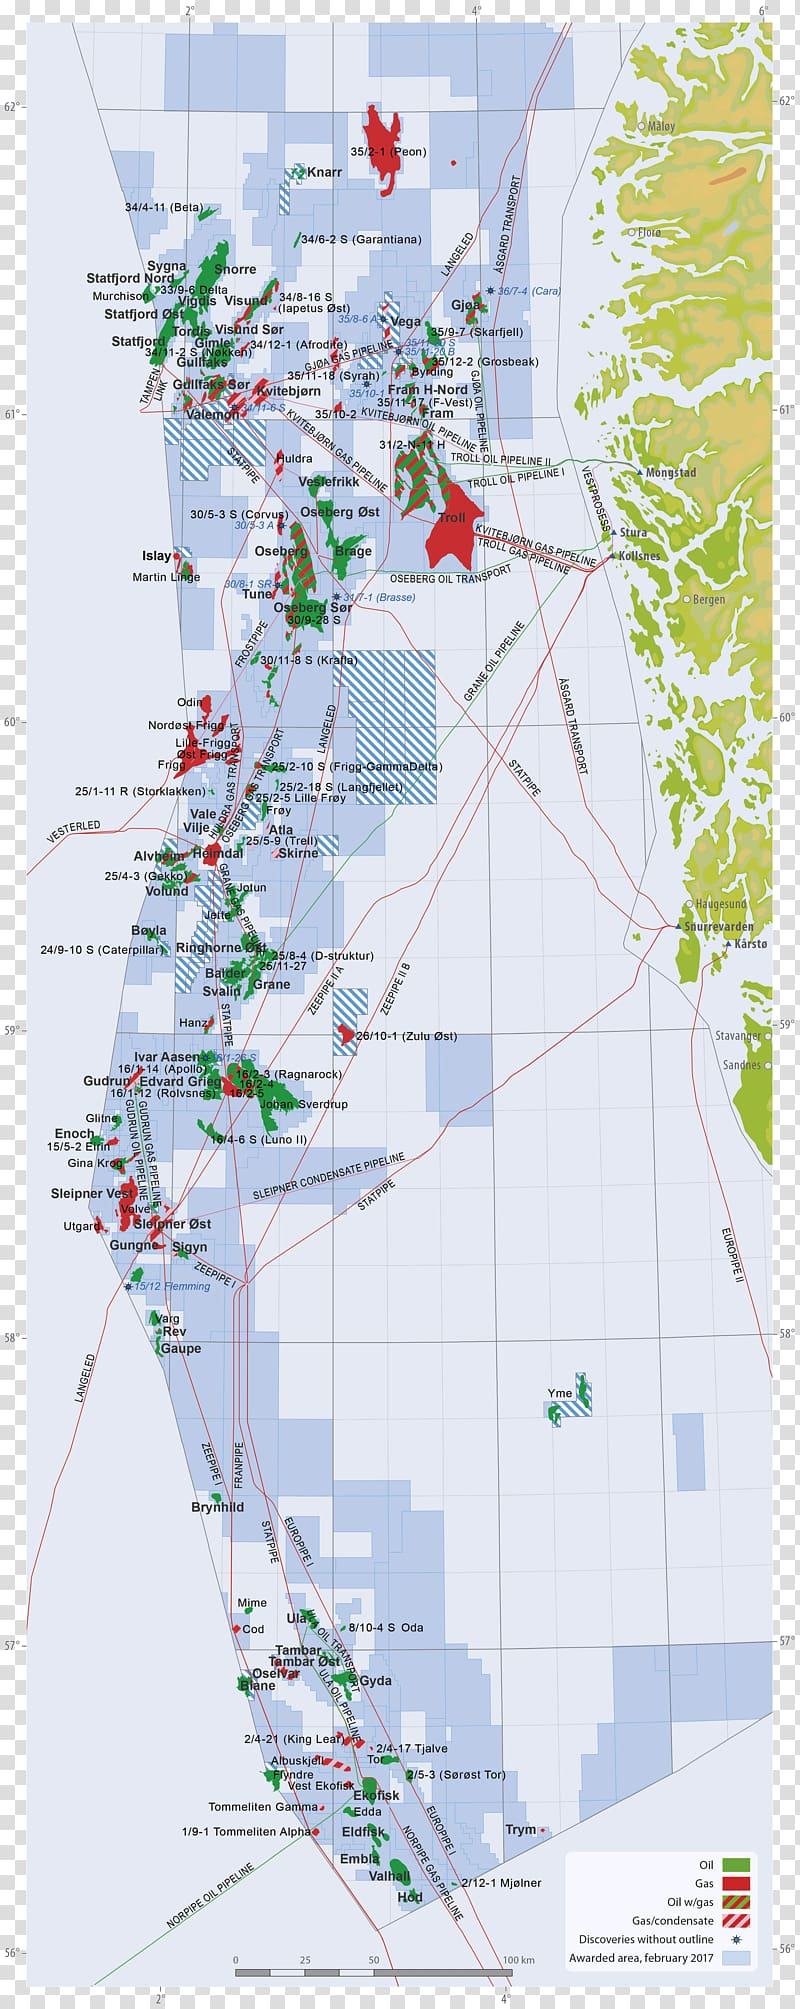 Stabroek, Guyana ExxonMobil Petroleum reservoir Esso.